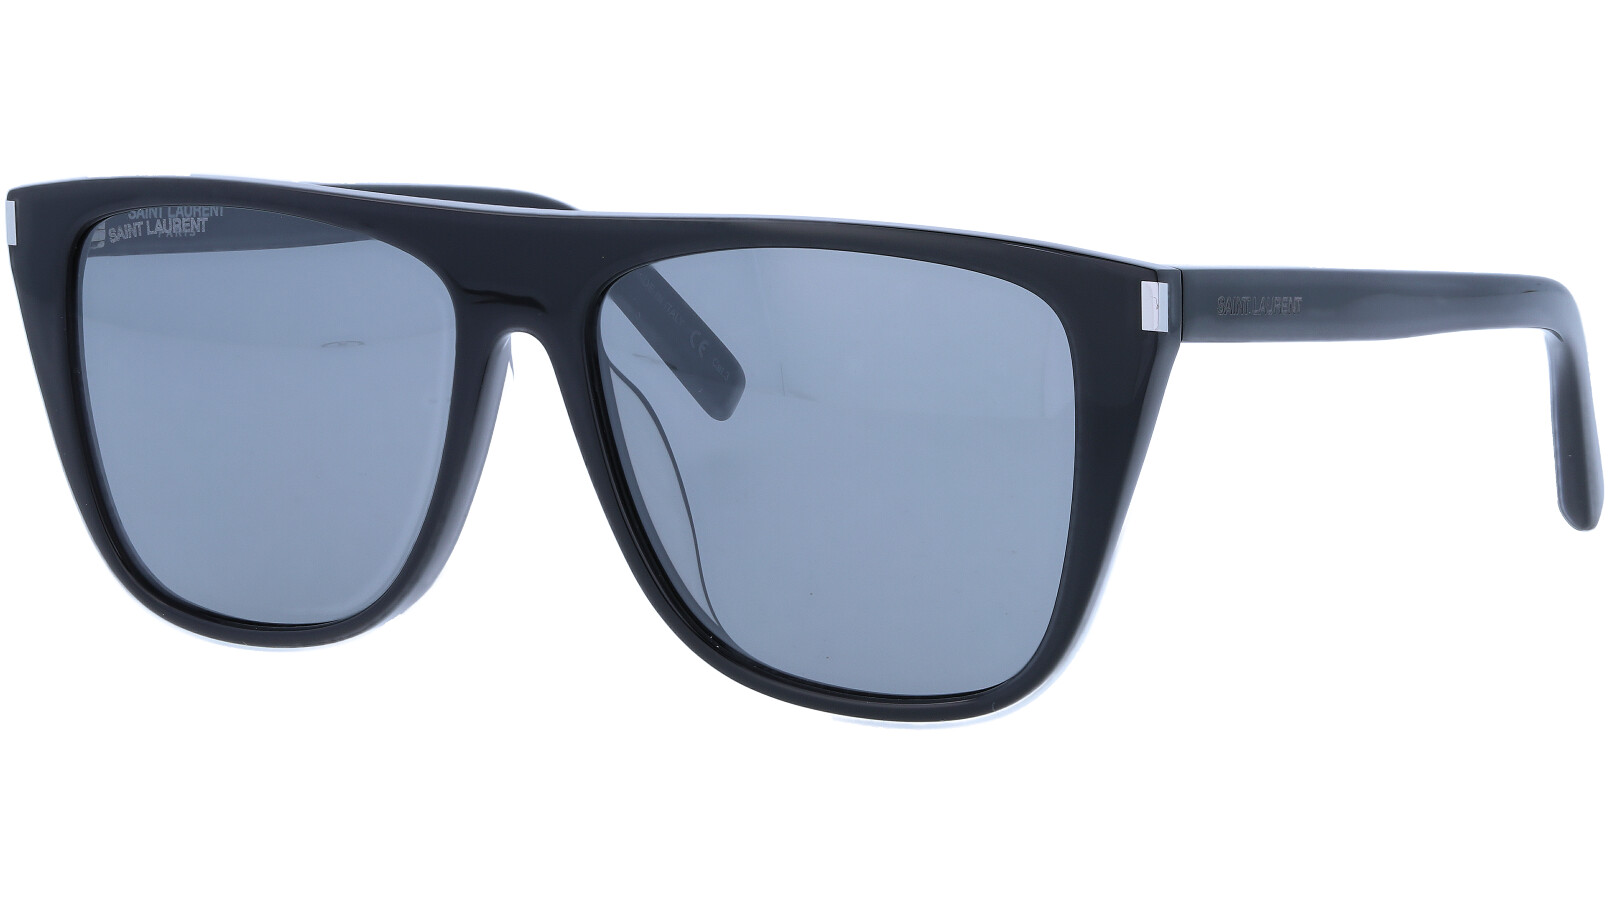 Saint Laurent SL1F 002 58 Black Sunglasses